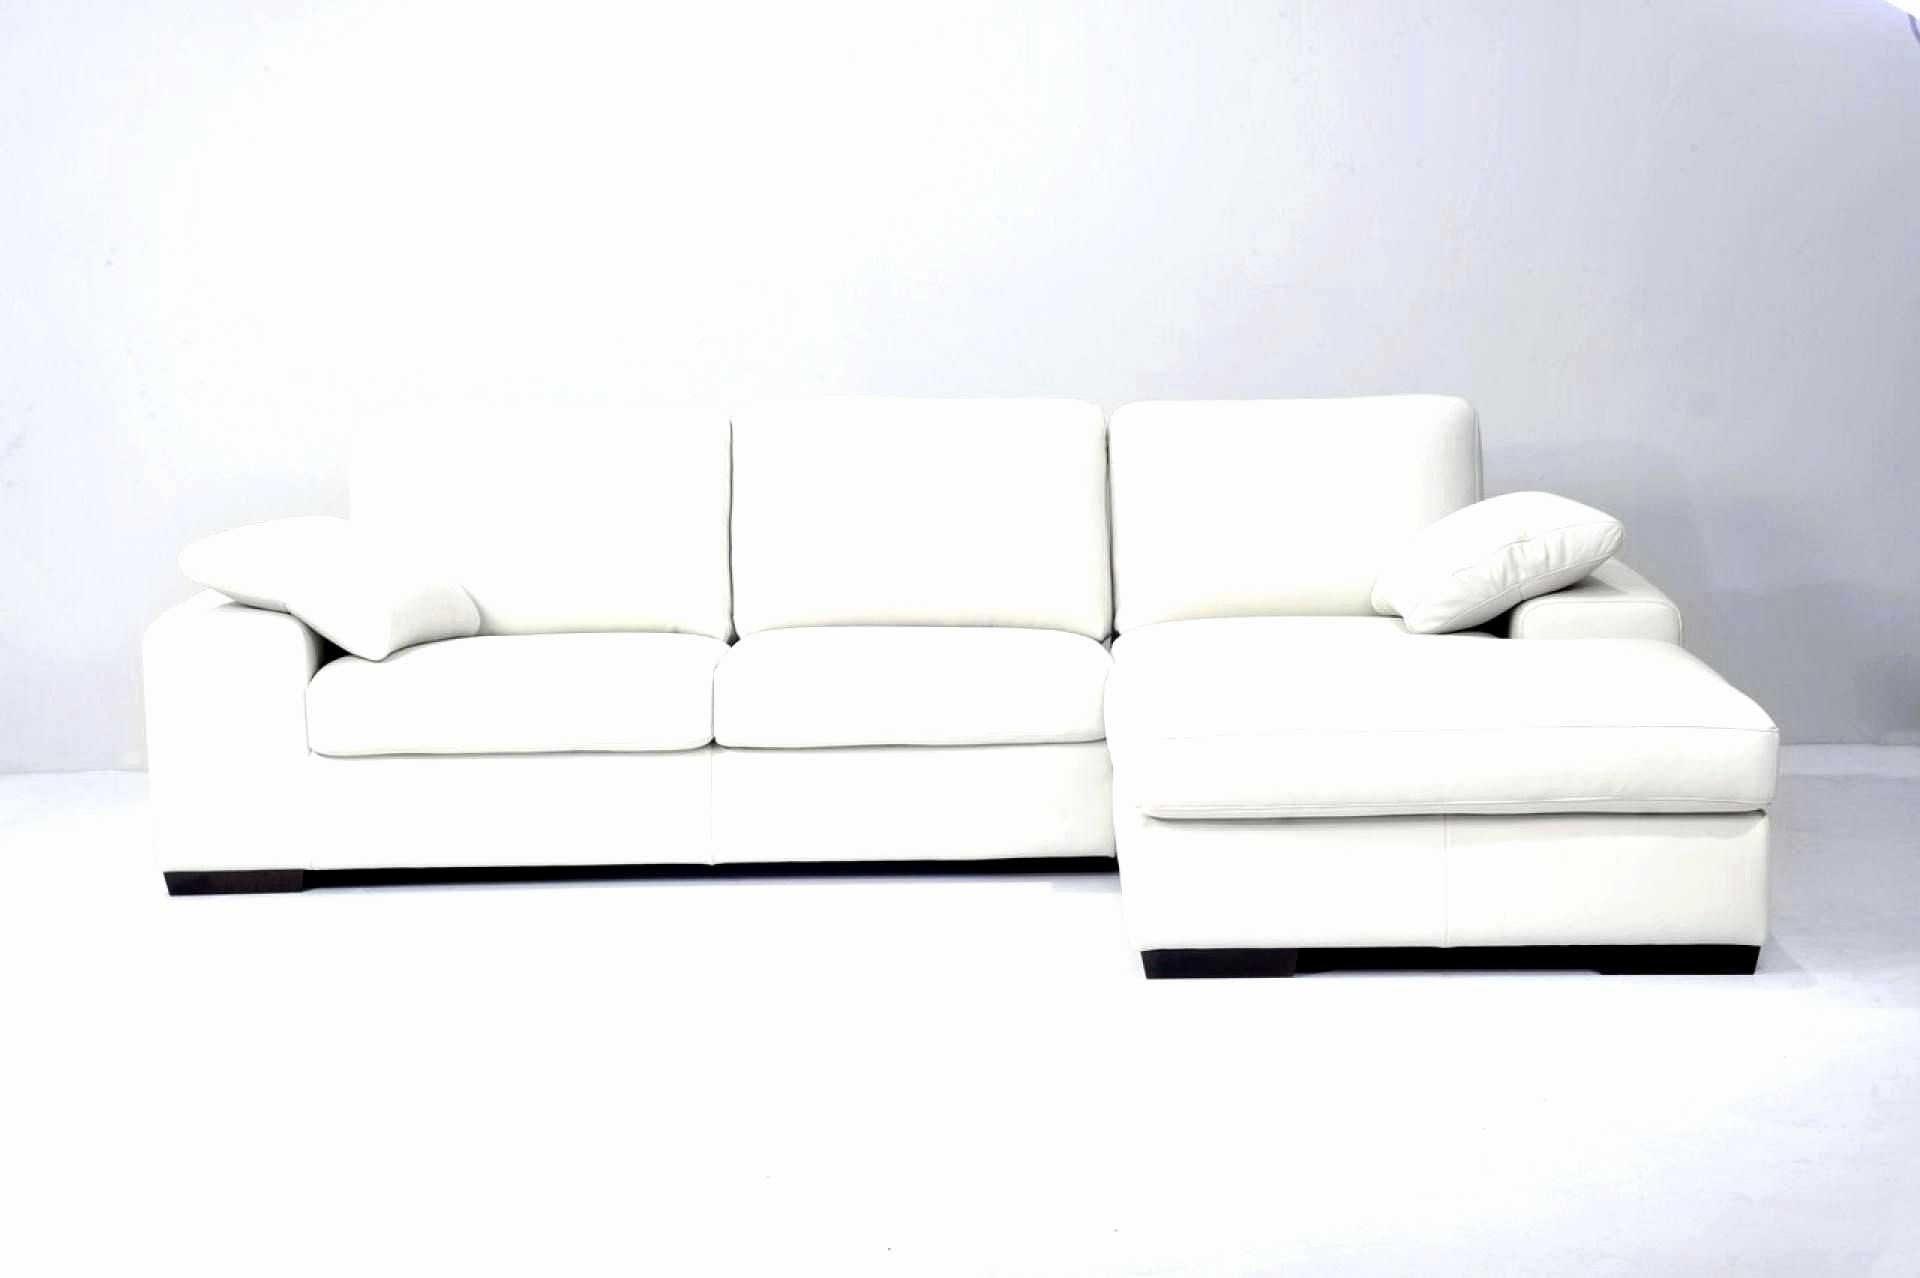 Lit Mezzanine Avec Clic Clac Ikea